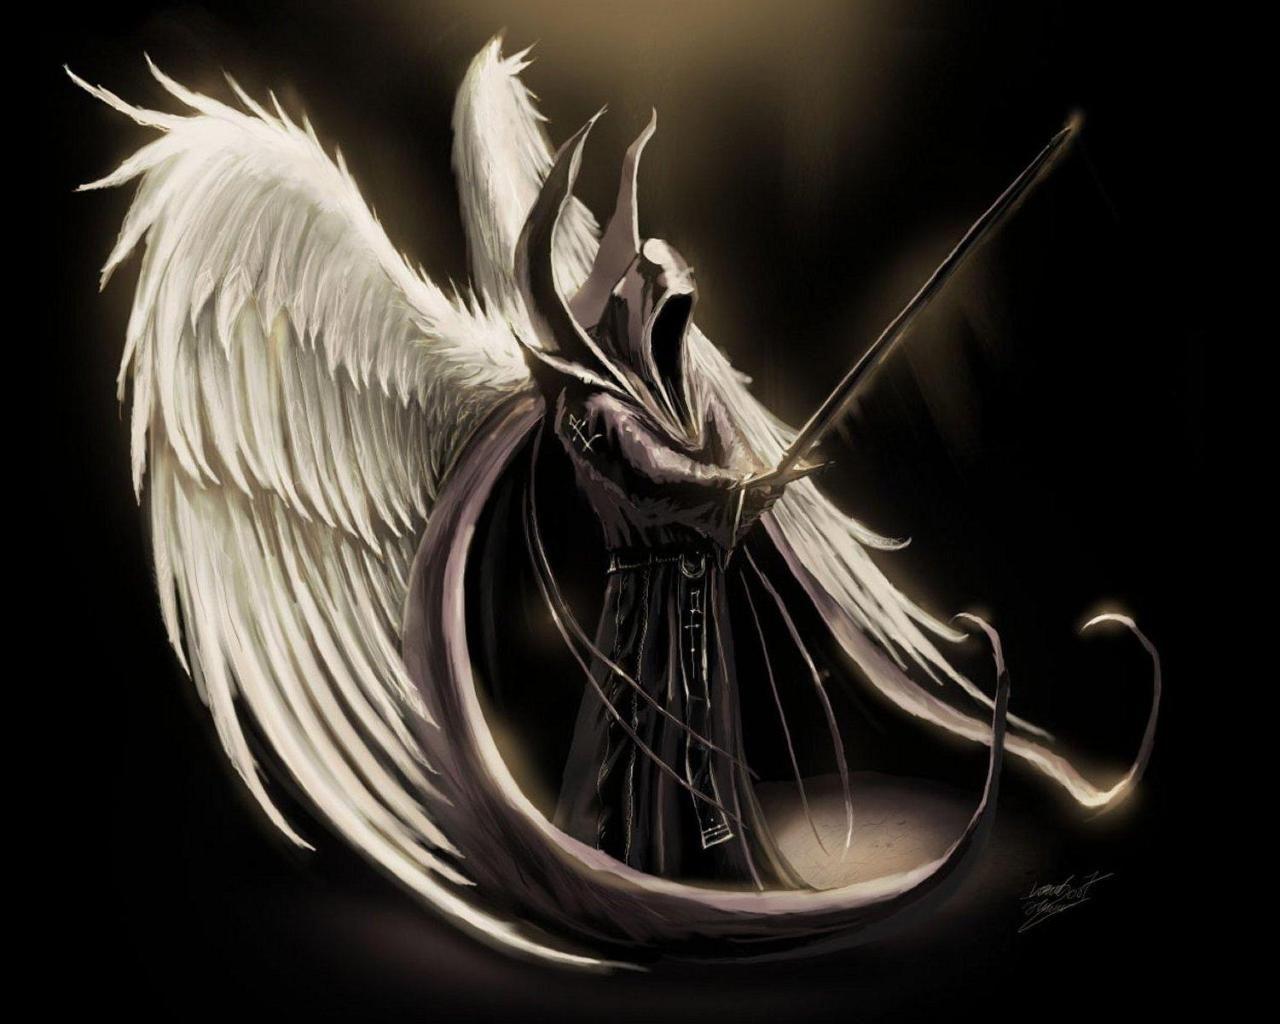 Seraphim Warriors Angels Hd Wallpapers Best Angel Wallpapers Dark Angel White Angel Hd Dark Angel Wallpaper Fallen Angel Art Angel Art